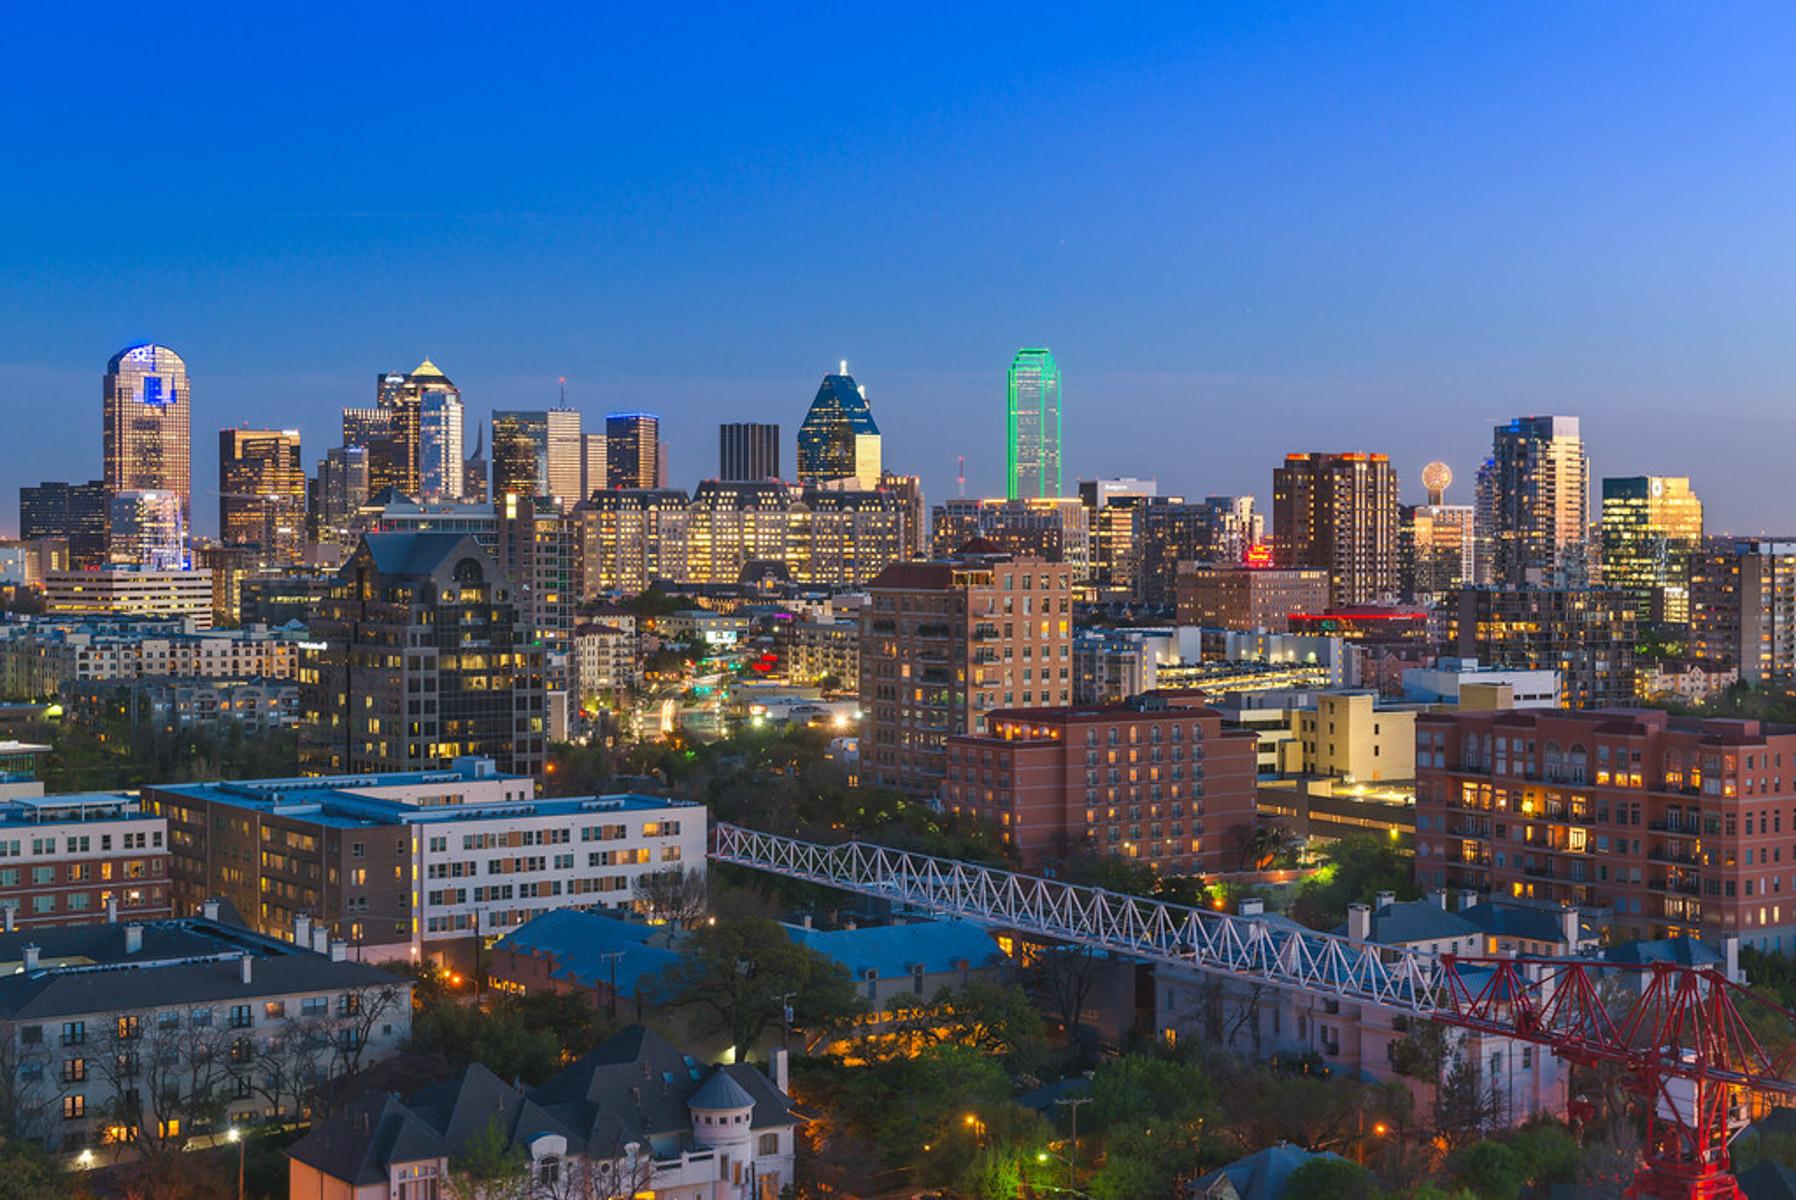 Condominium for Sale at 3111 Welborn Street 1304, Dallas 3111 Welborn St 1304 Dallas, Texas, 75219 United States